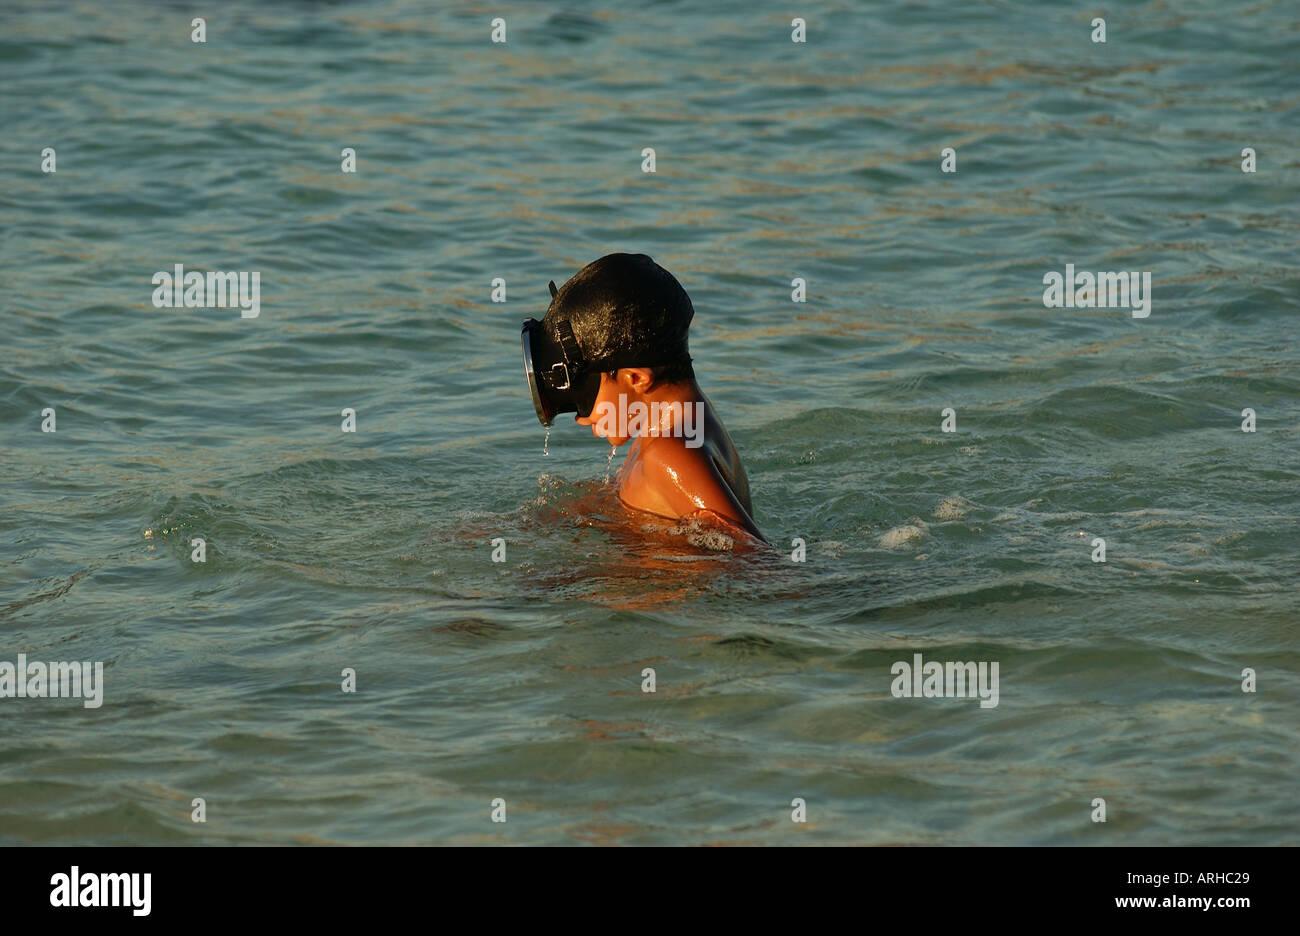 Acclaim Images - polynesian boy photos, stock photos, images, pictures, polynesian  boy clipart & polynesian boy stock photography